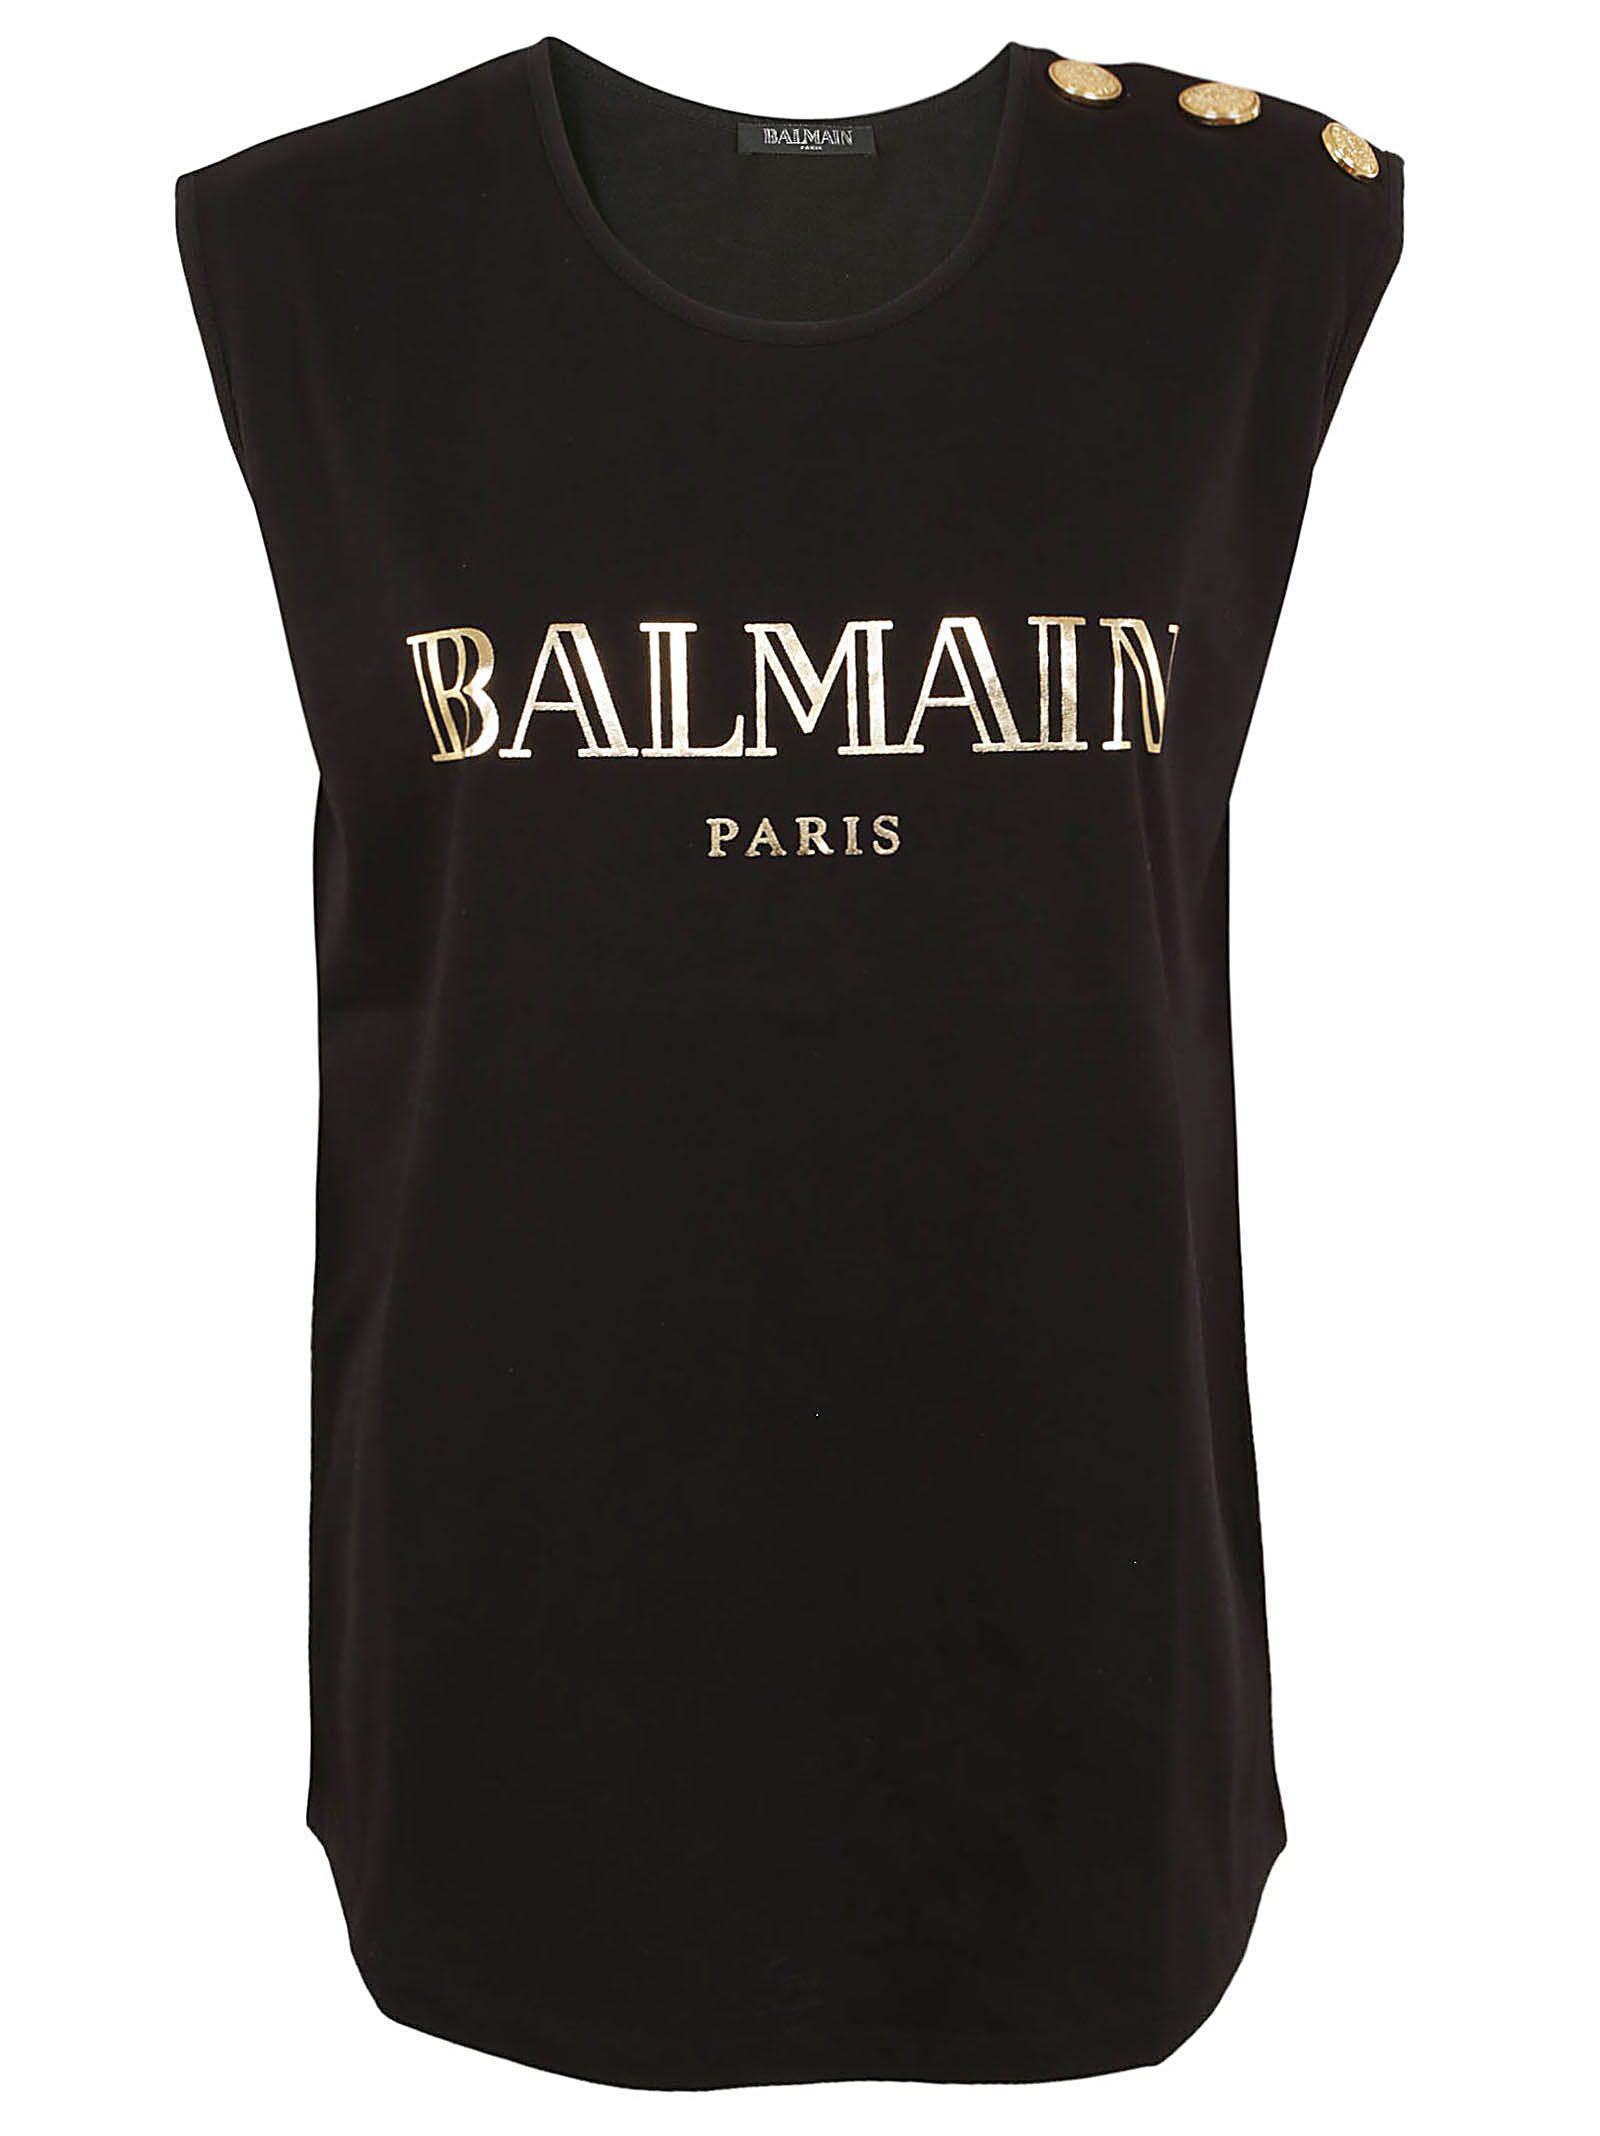 392730b9 Balmain Logo Cotton Jersey Sleeveless T-Shirt In Black | ModeSens